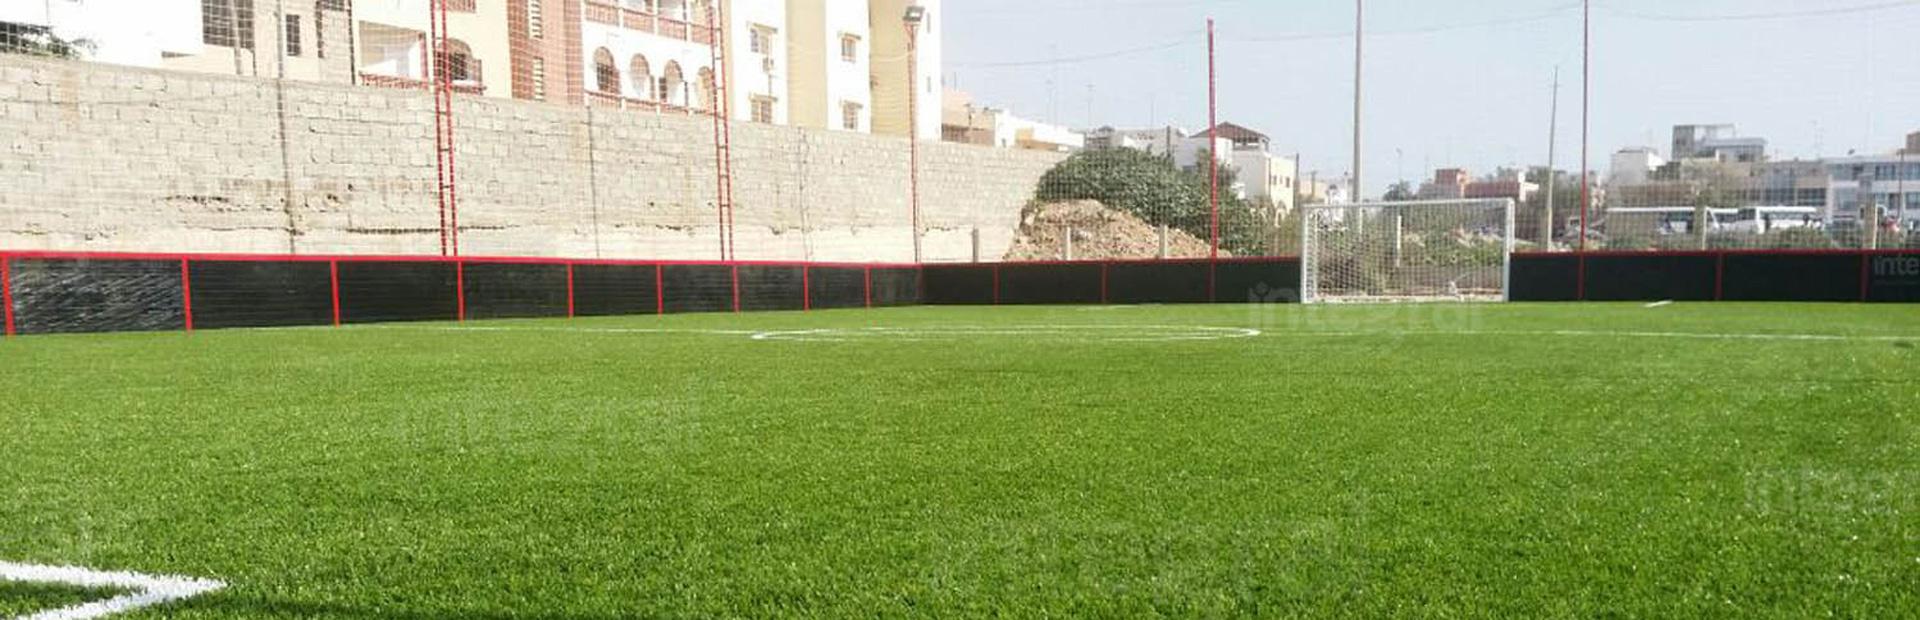 Modular Mini Outdoor Football Field